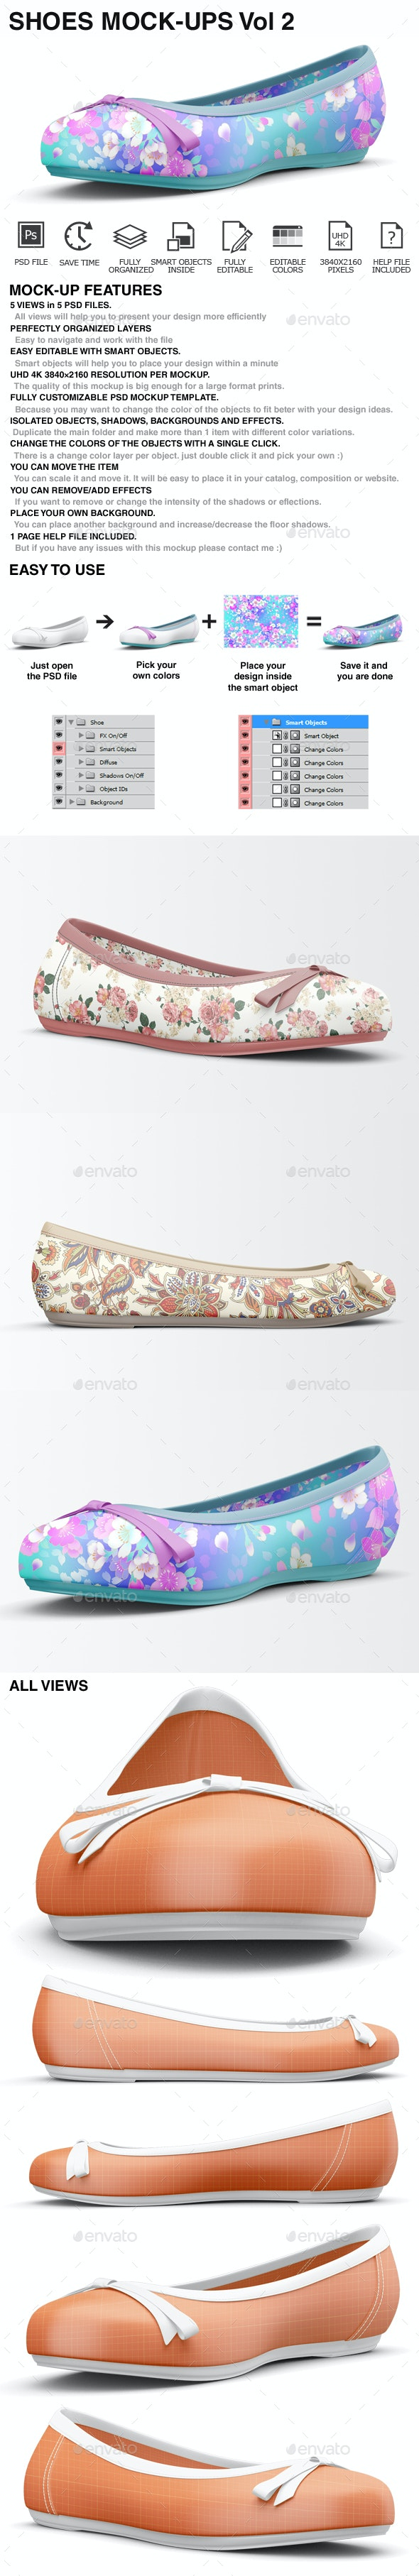 Shoes Mockup - Woman Shoes Mockups - Miscellaneous Apparel